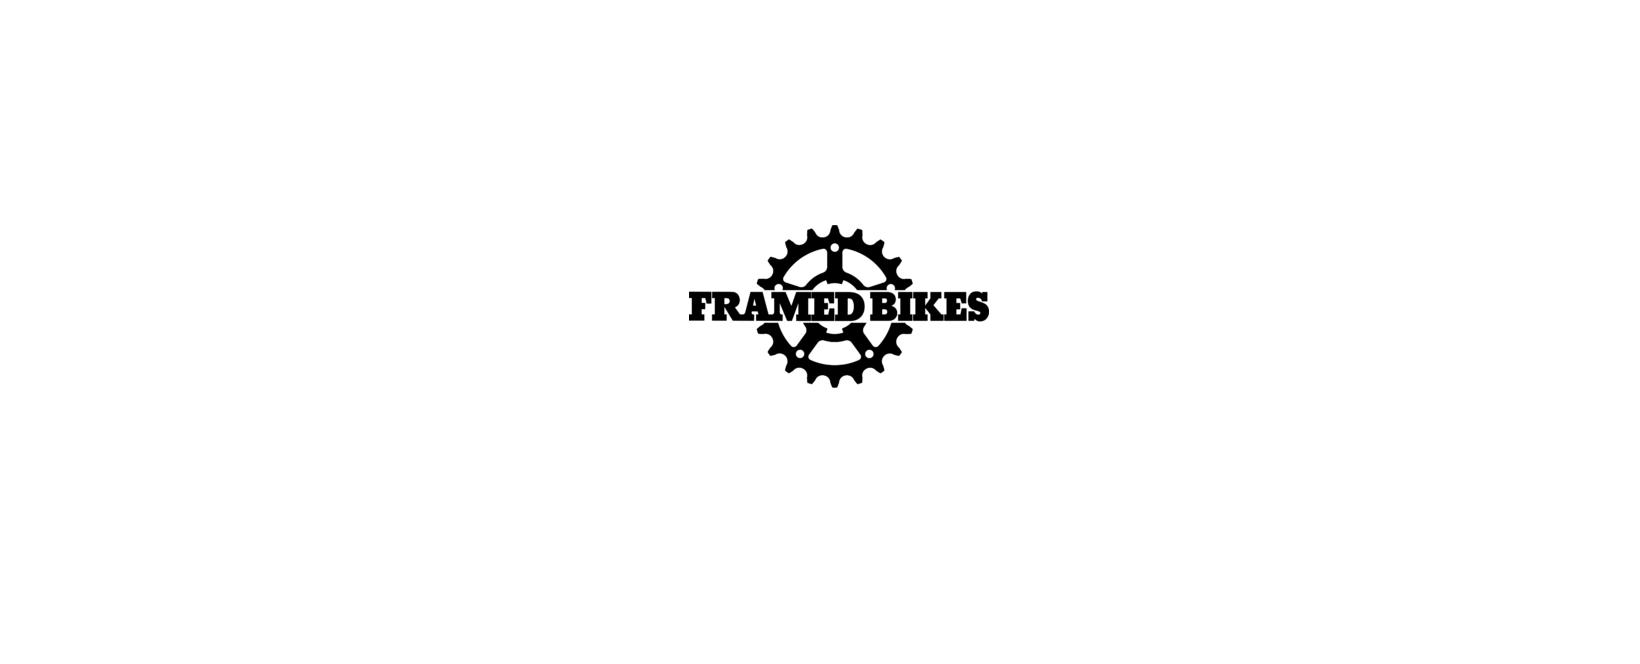 Framed Bikes Discount Code 2021